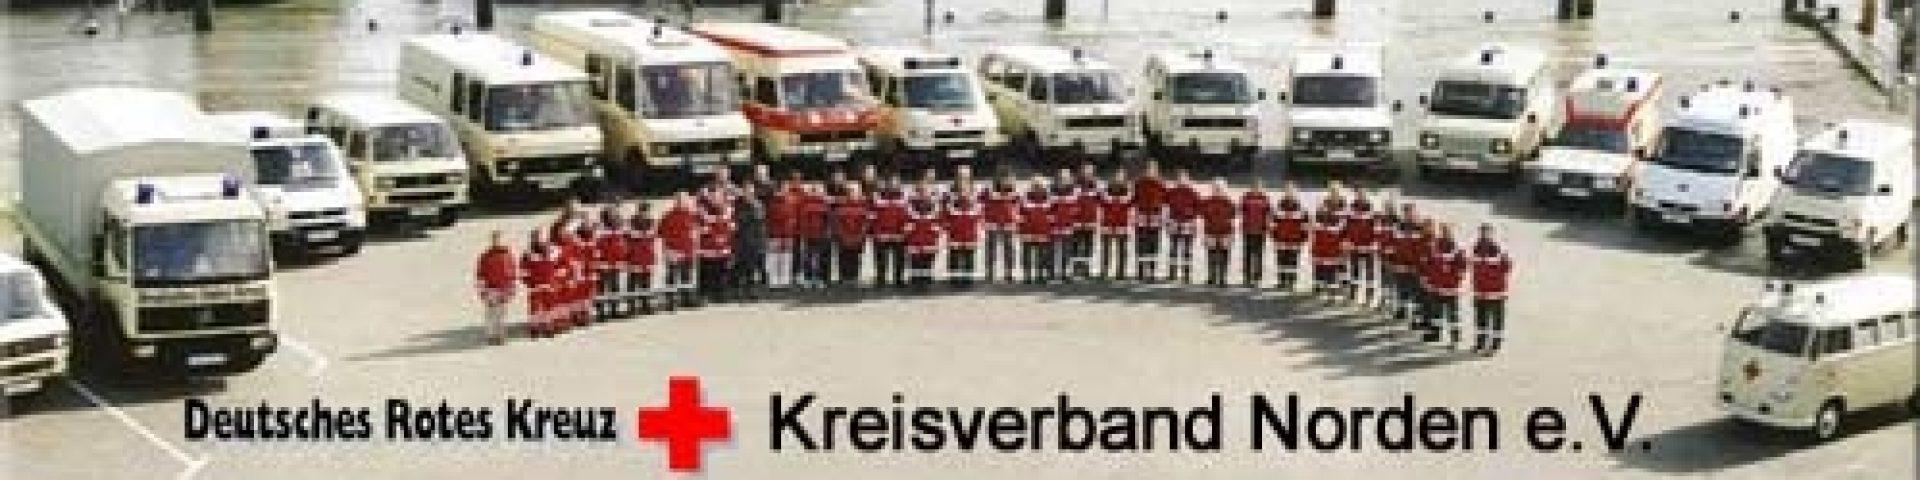 DRK Ortsverein Loppersum